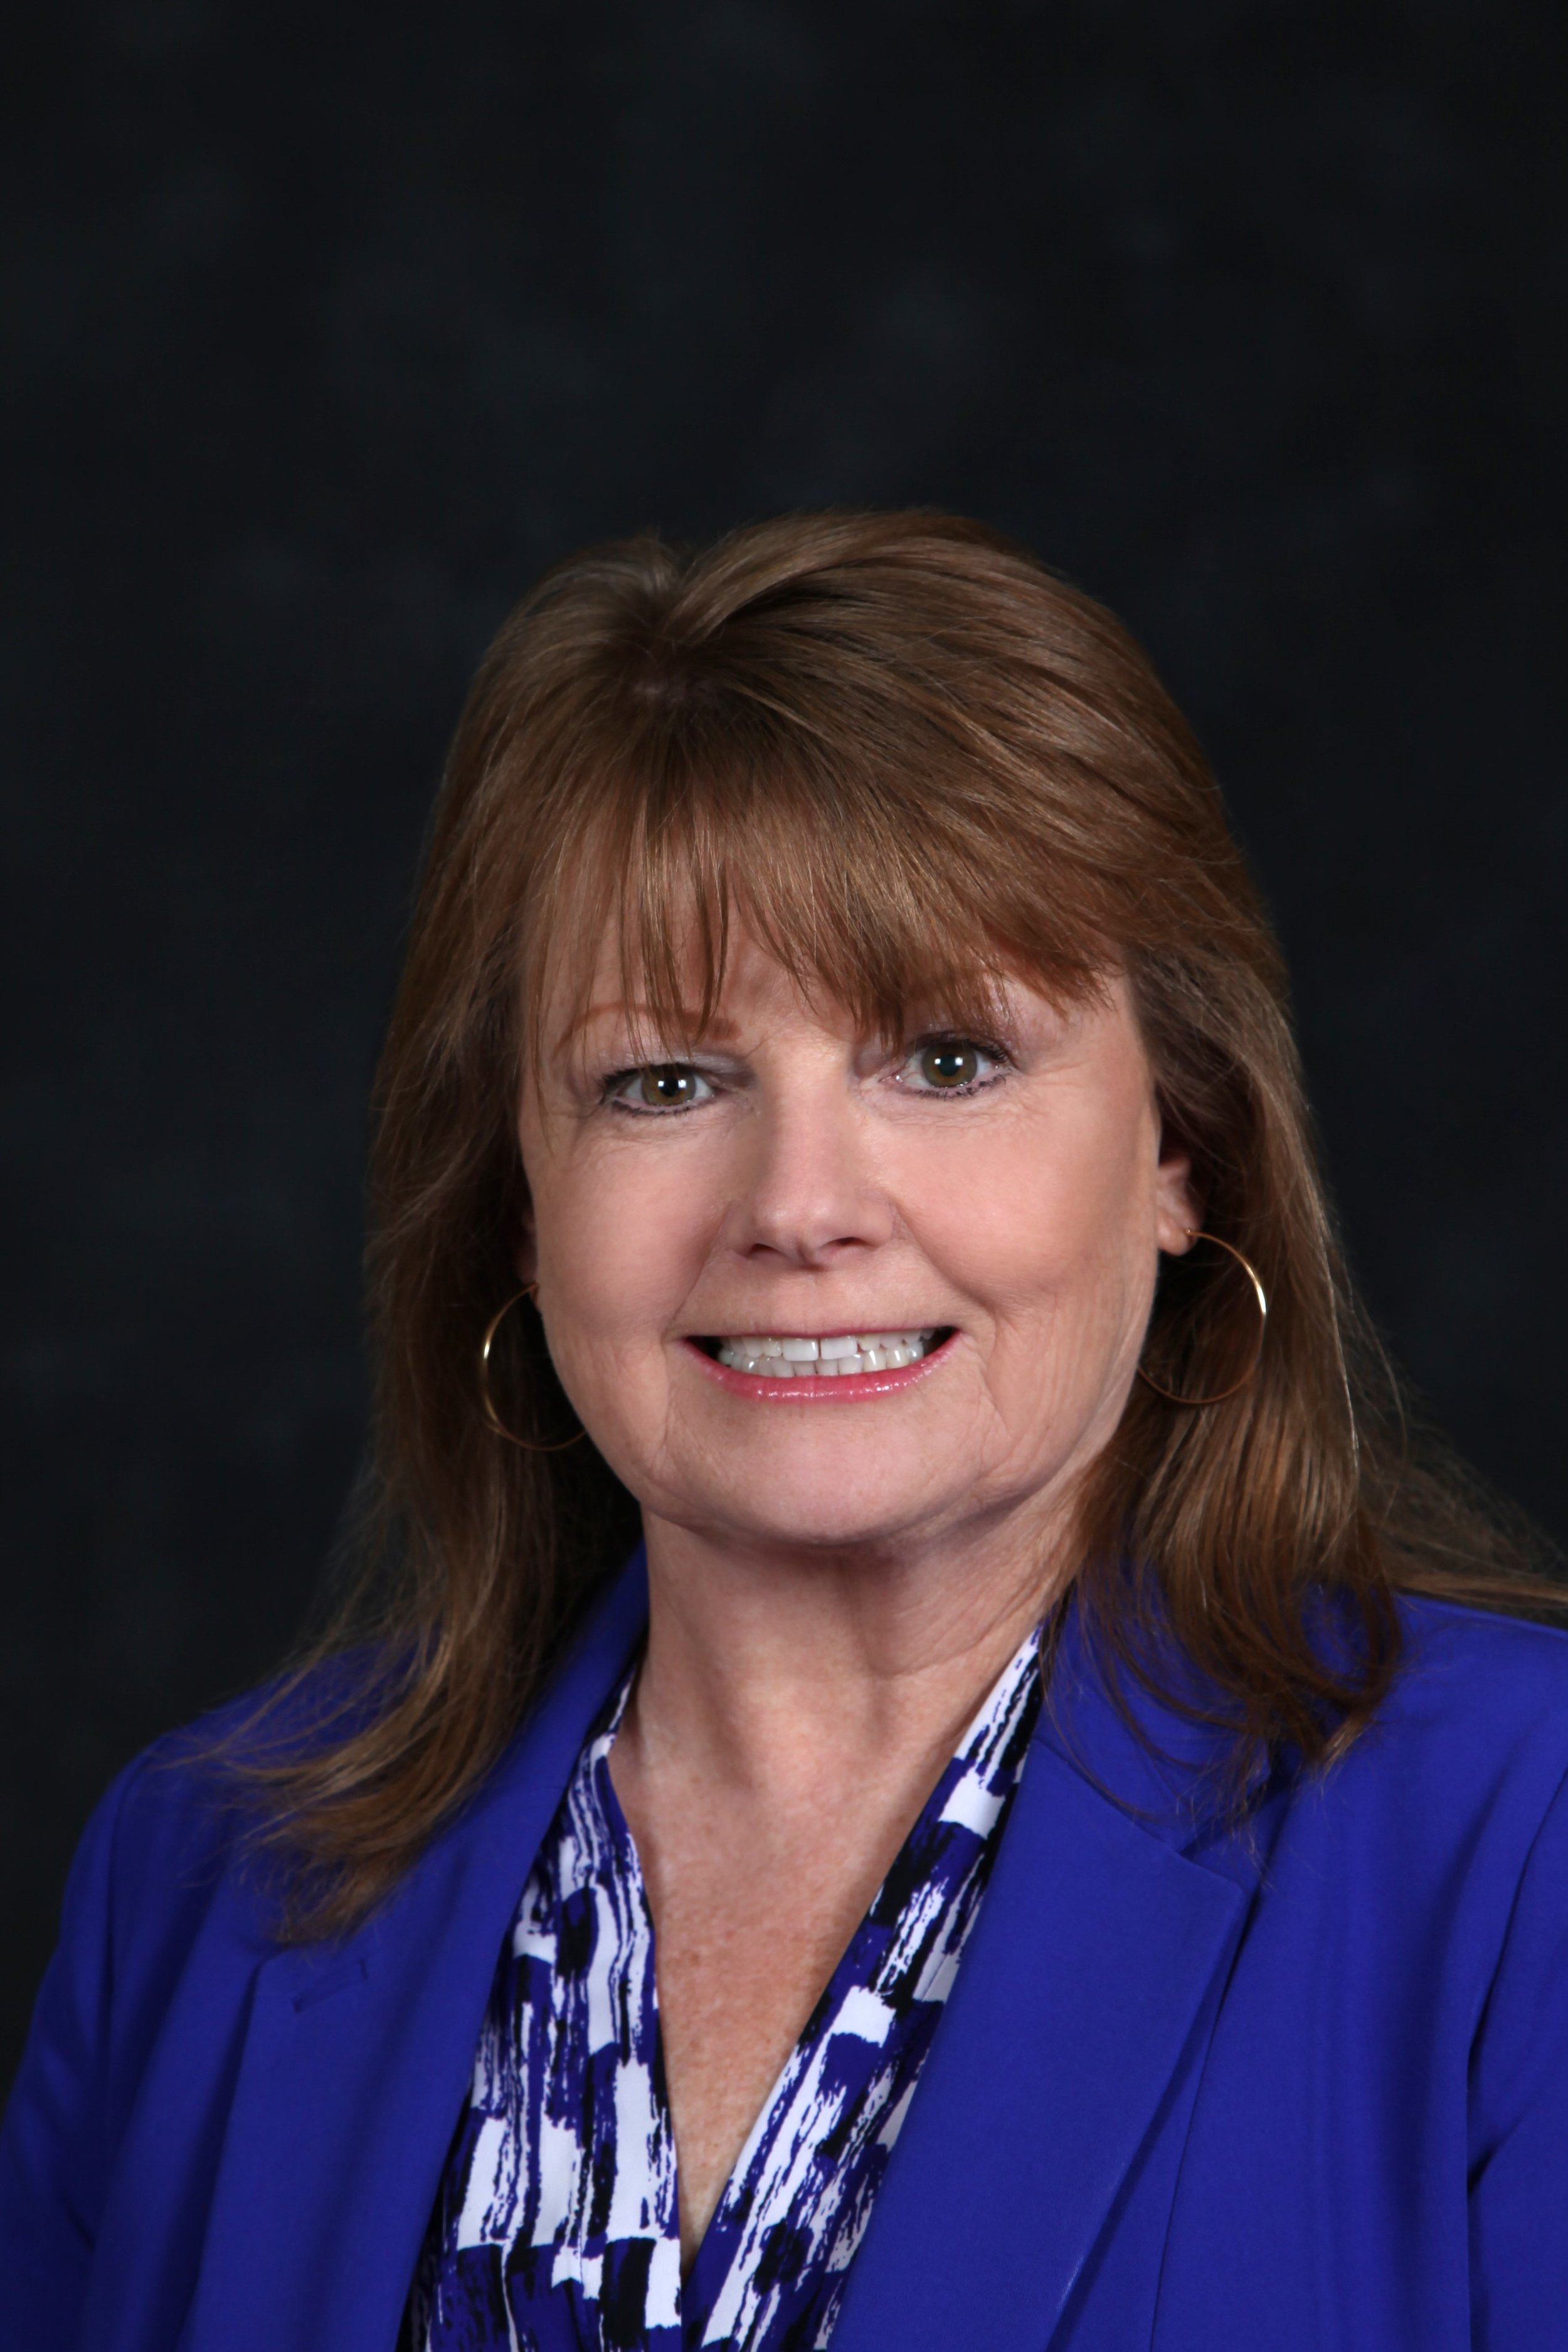 Councilwoman Kristin Inman - Mission